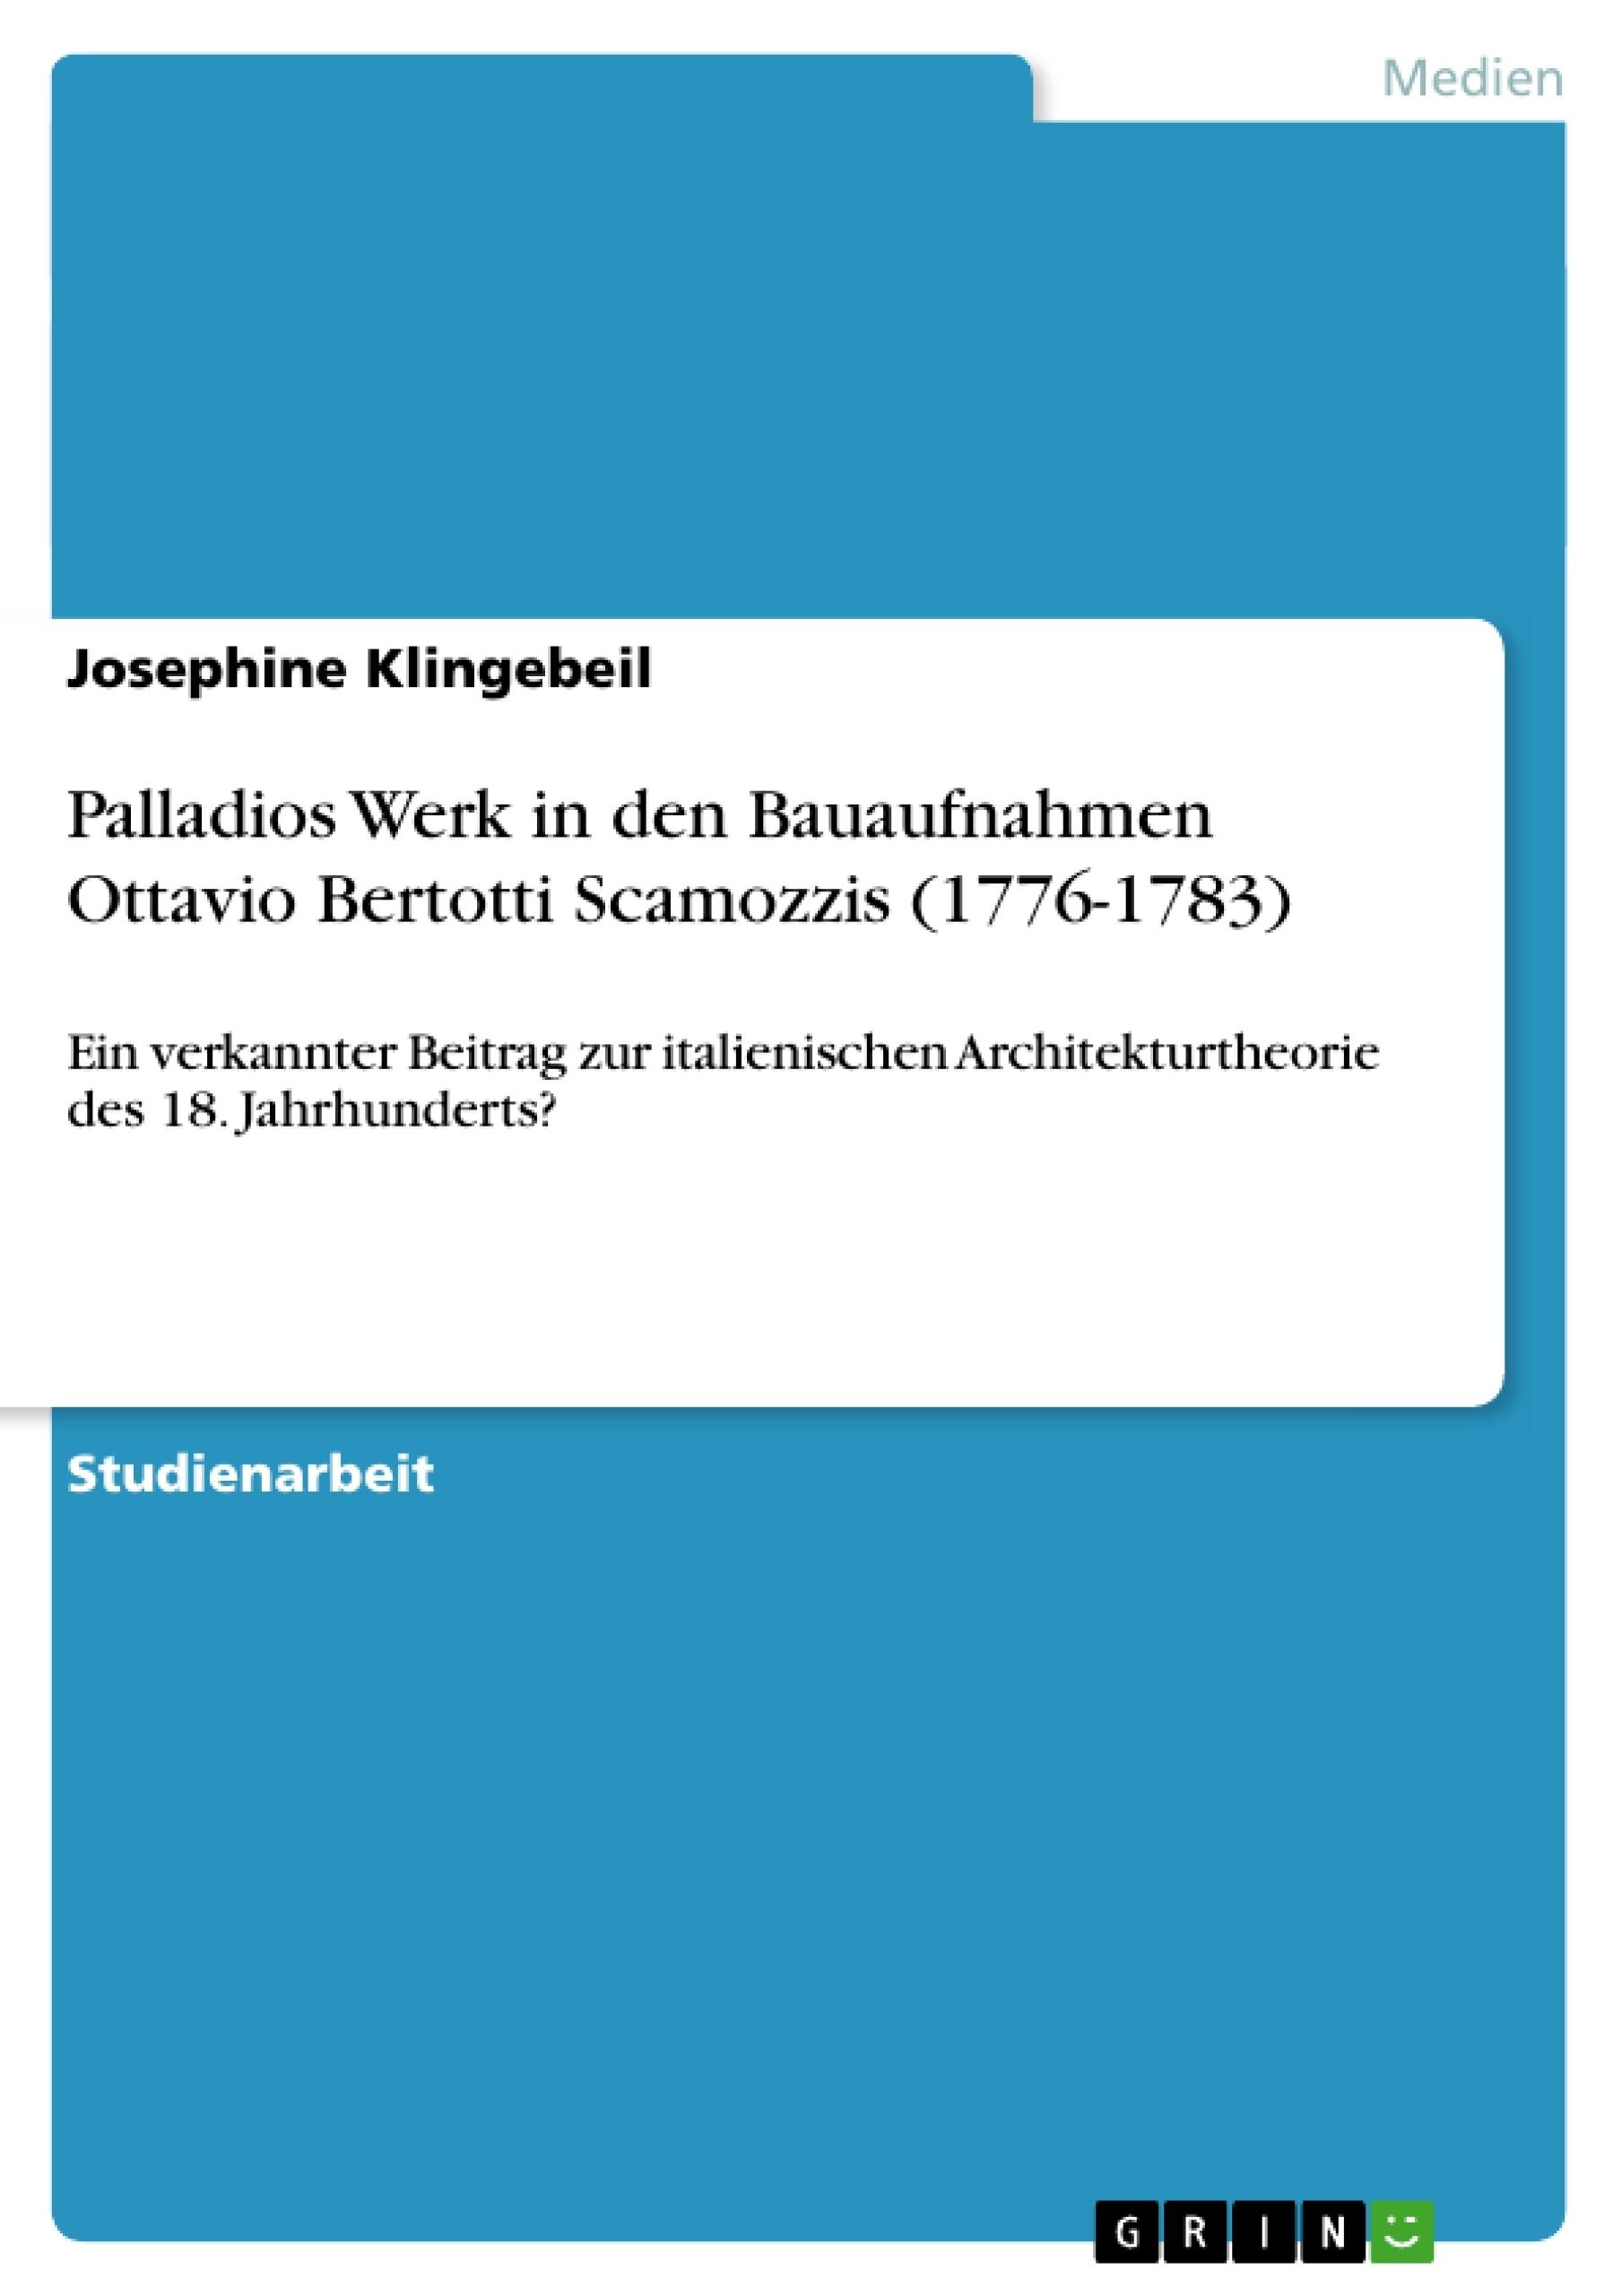 Titel: Palladios Werk in den Bauaufnahmen Ottavio Bertotti Scamozzis (1776-1783)